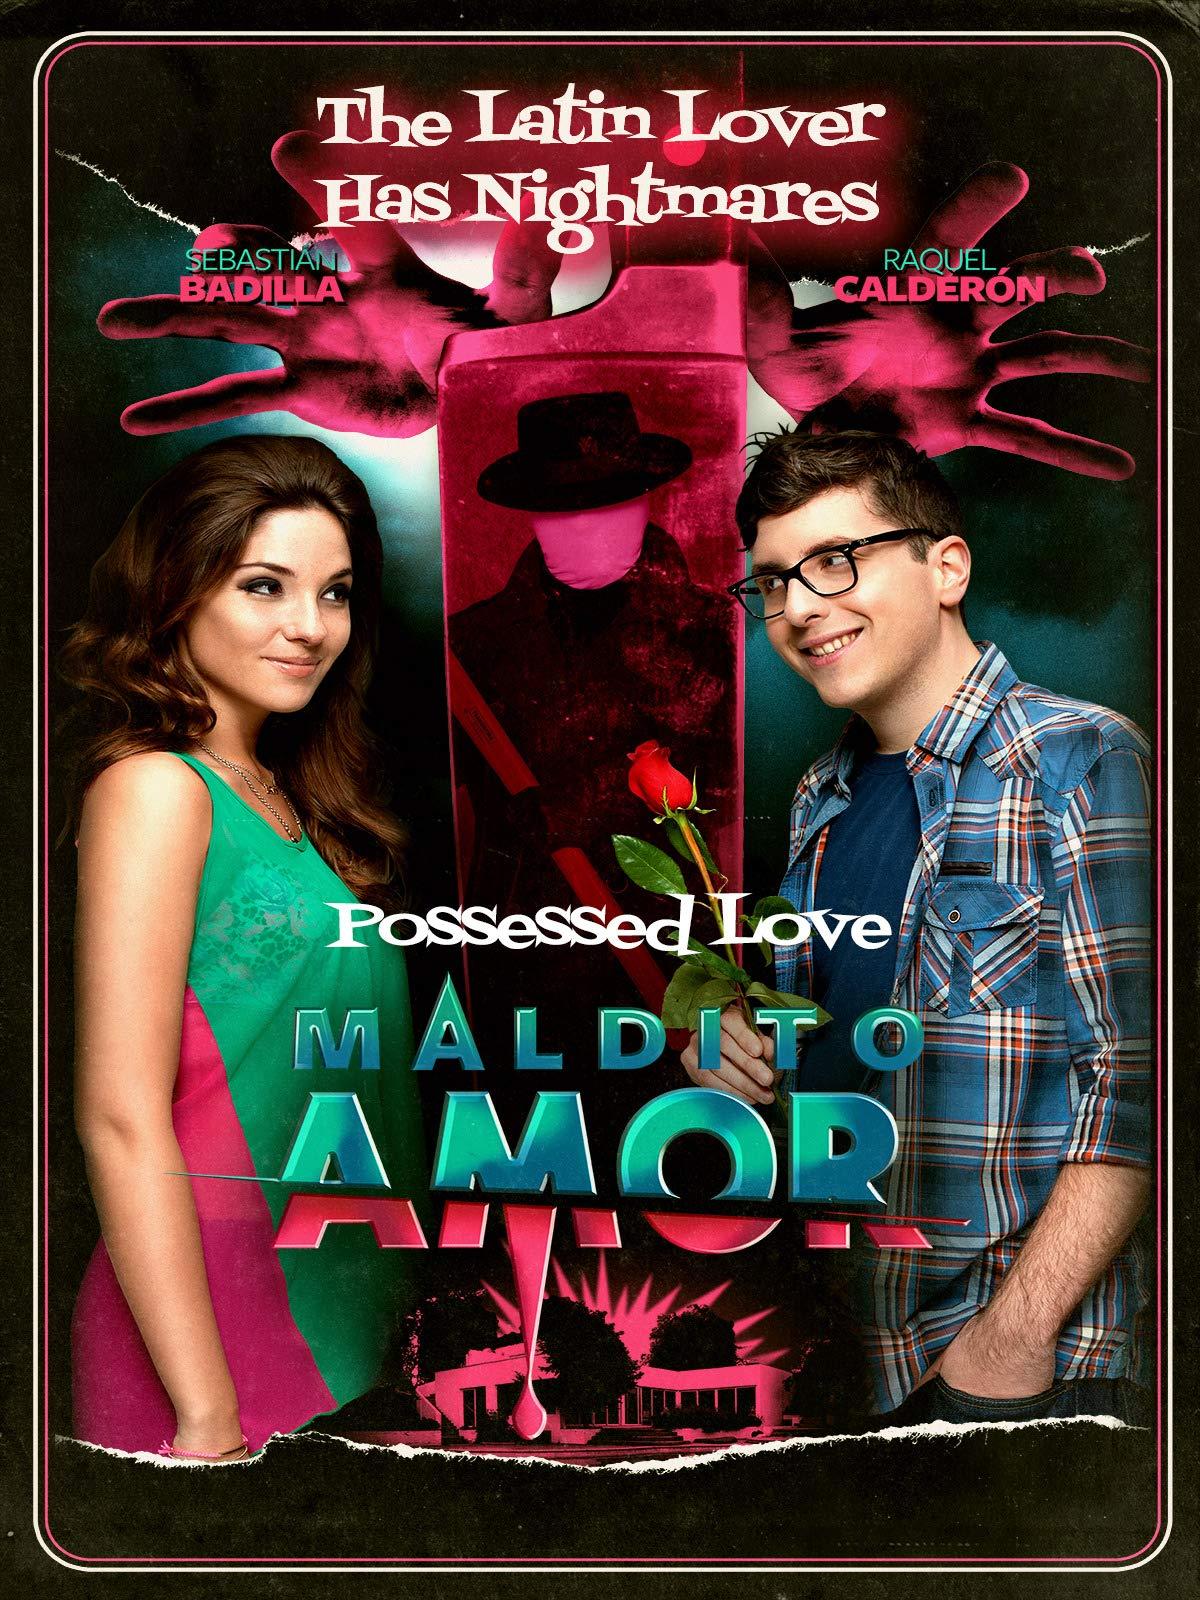 Latin Lover - Possessed Love on Amazon Prime Video UK